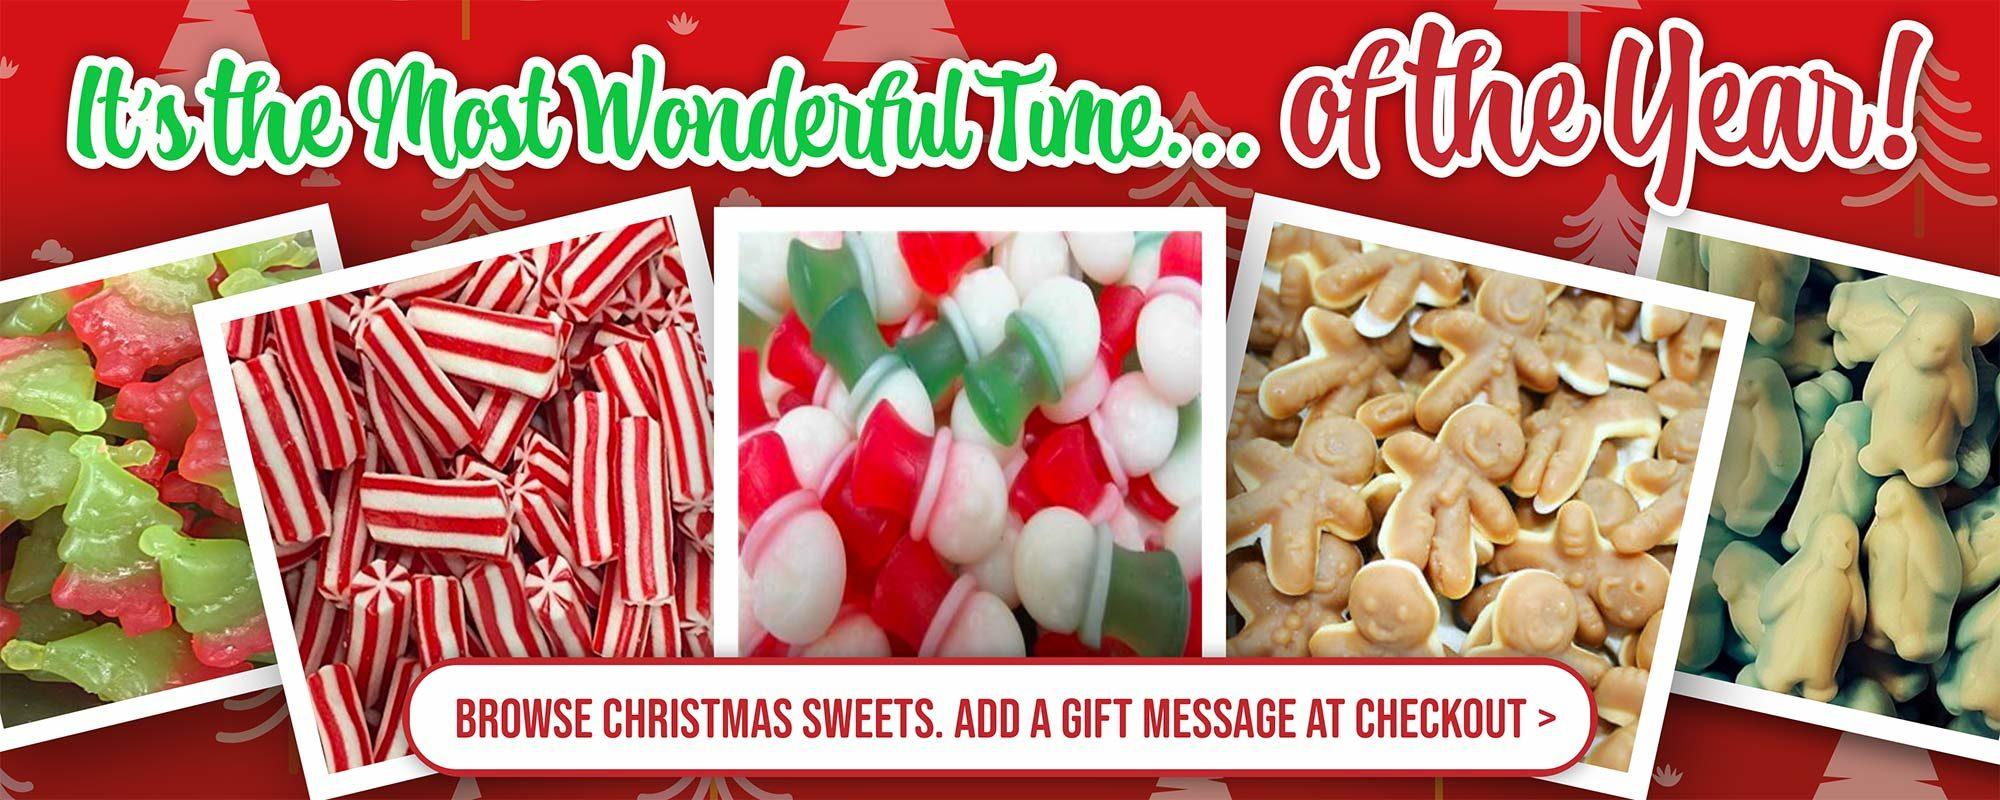 Browse Christmas Sweets